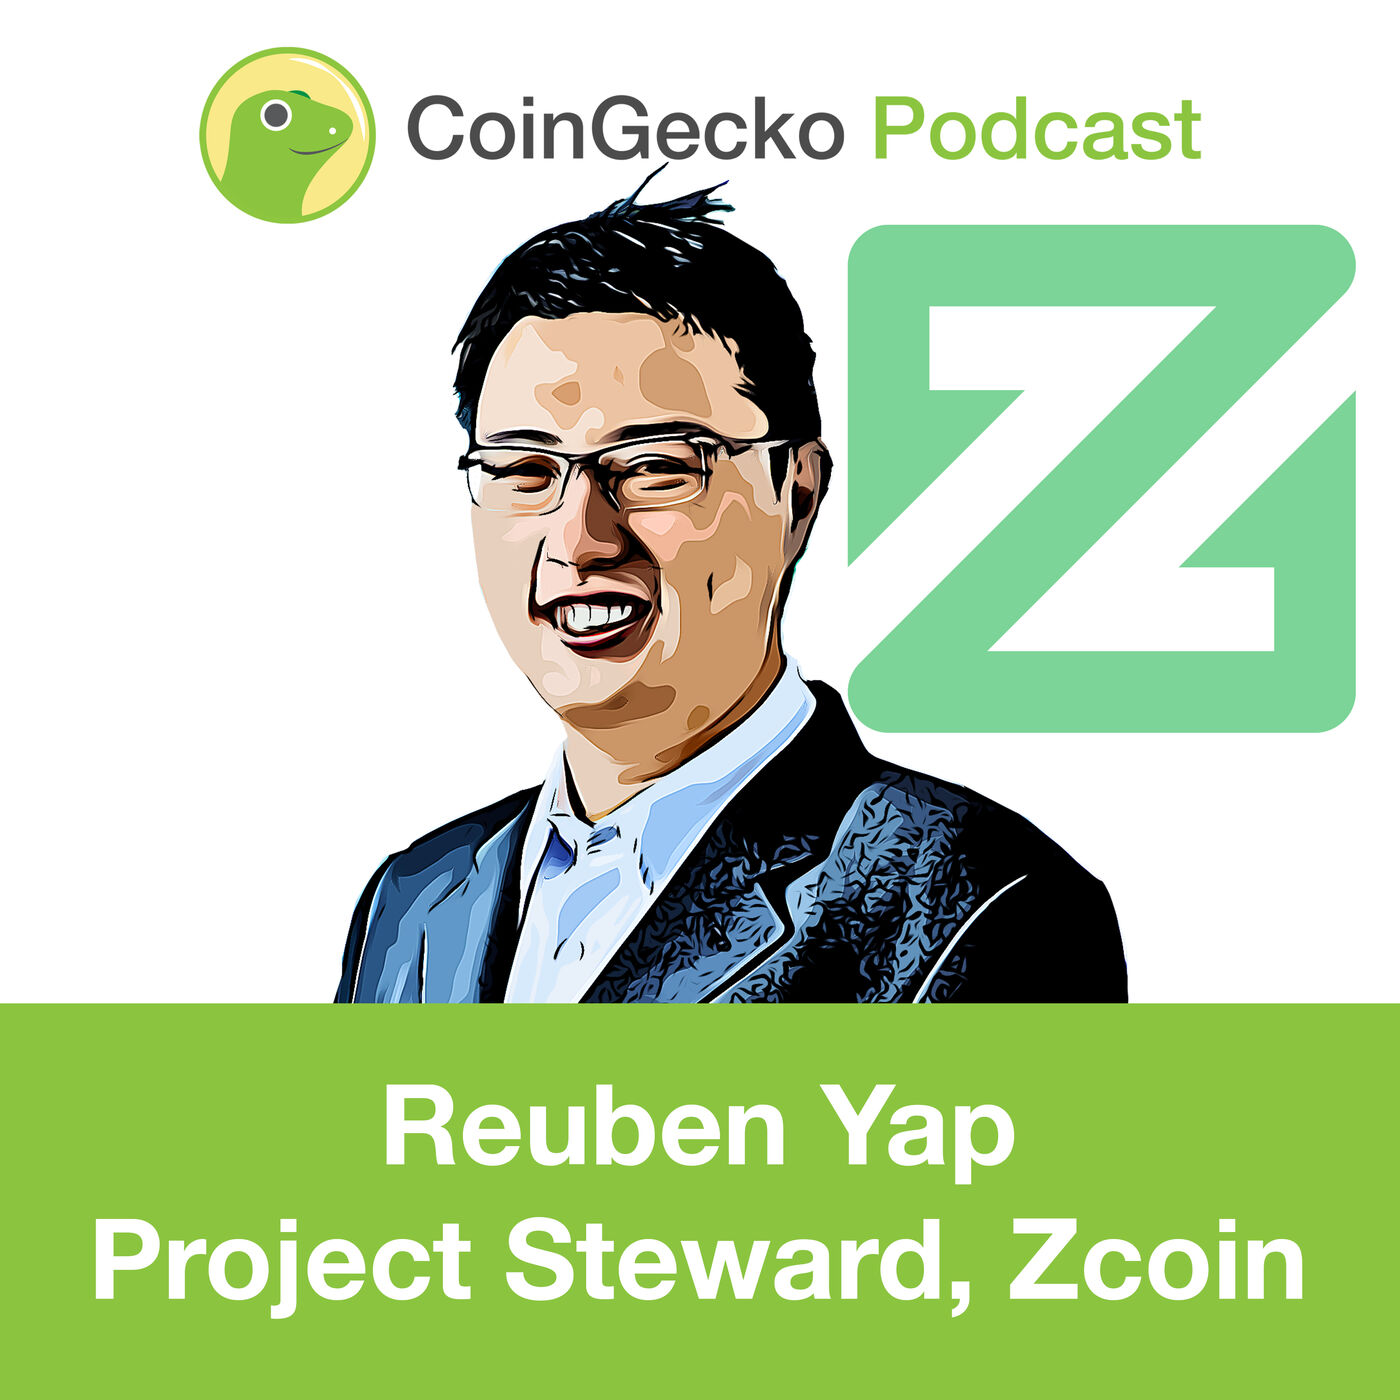 Reuben Yap, Project Steward of Zcoin Talks About Blockchain Governance - Ep. 5